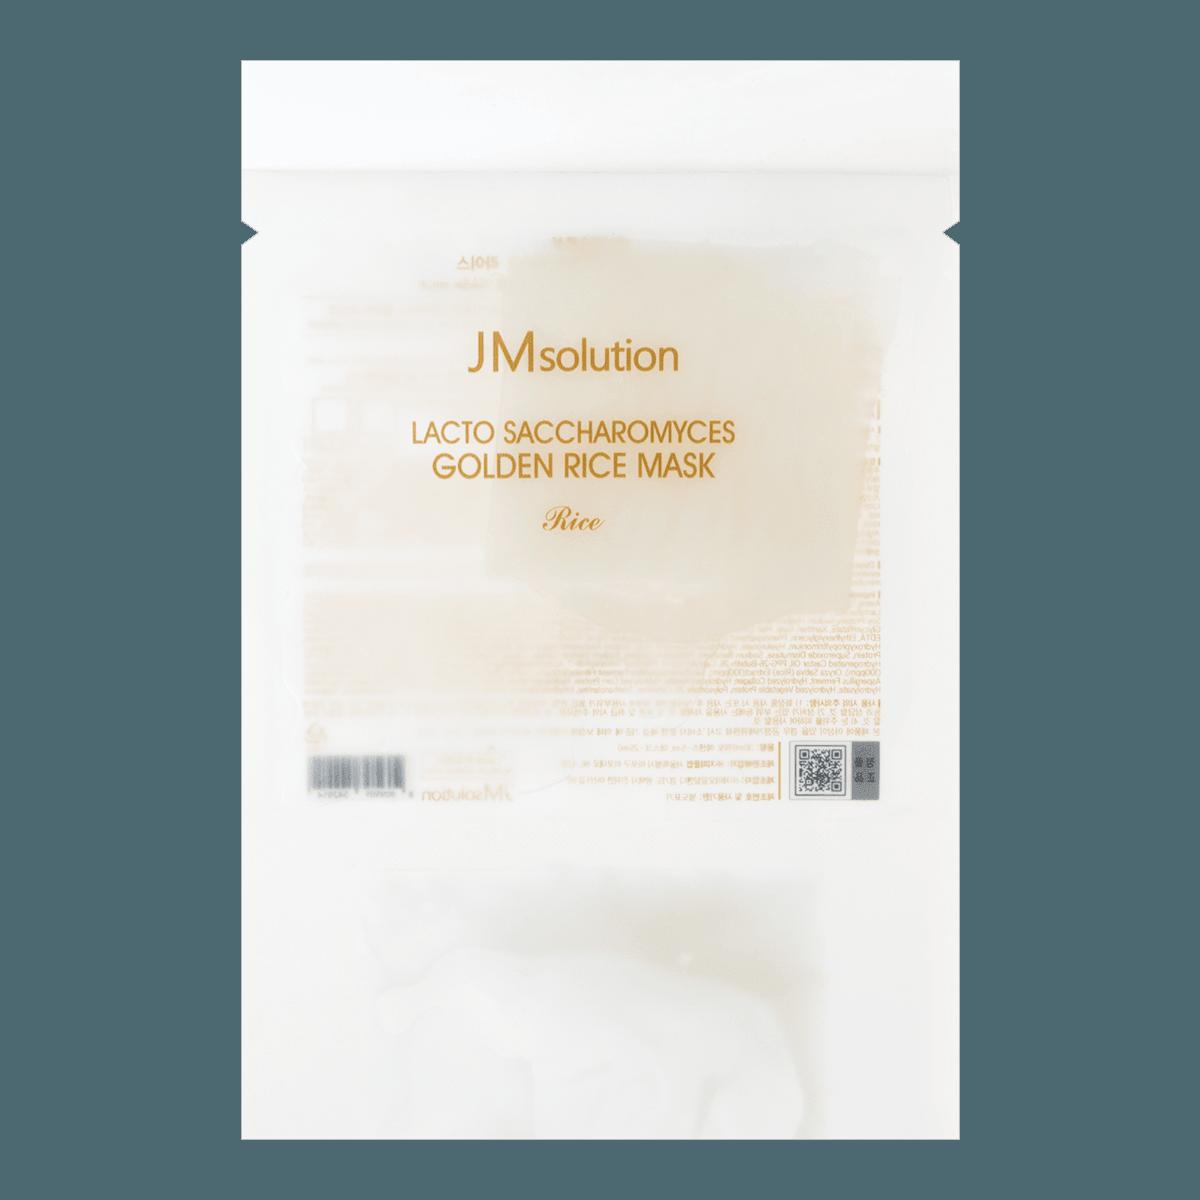 韩国JMSOLUTION 酵母乳黄金米面膜 大米版 单片入